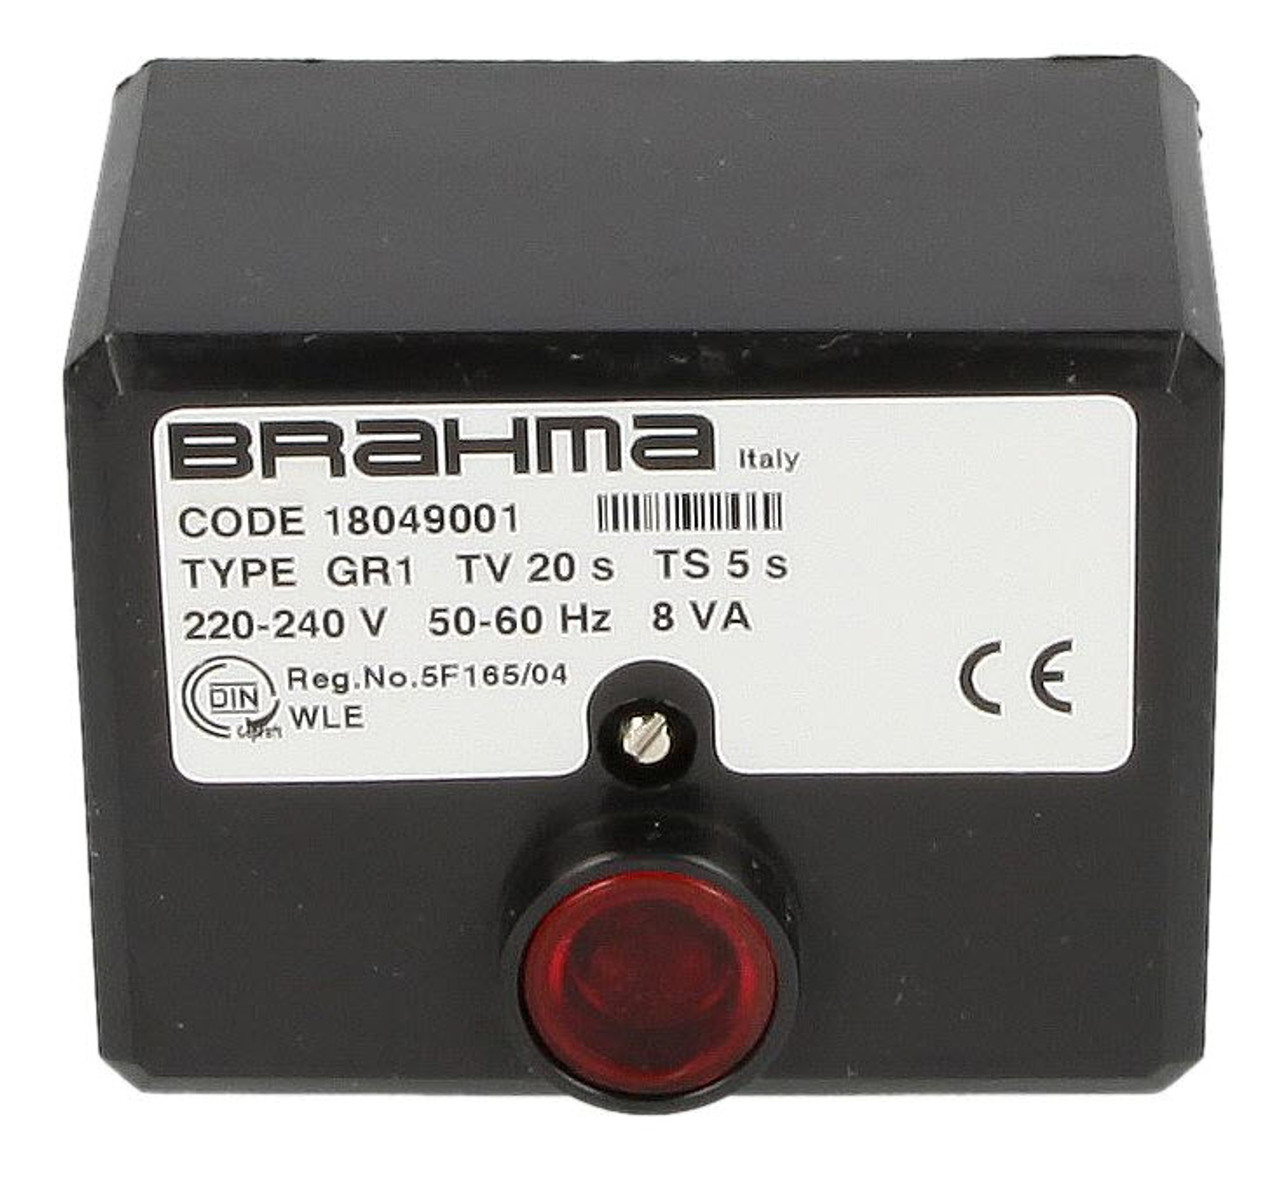 Brahma control unit GR1, 18049001